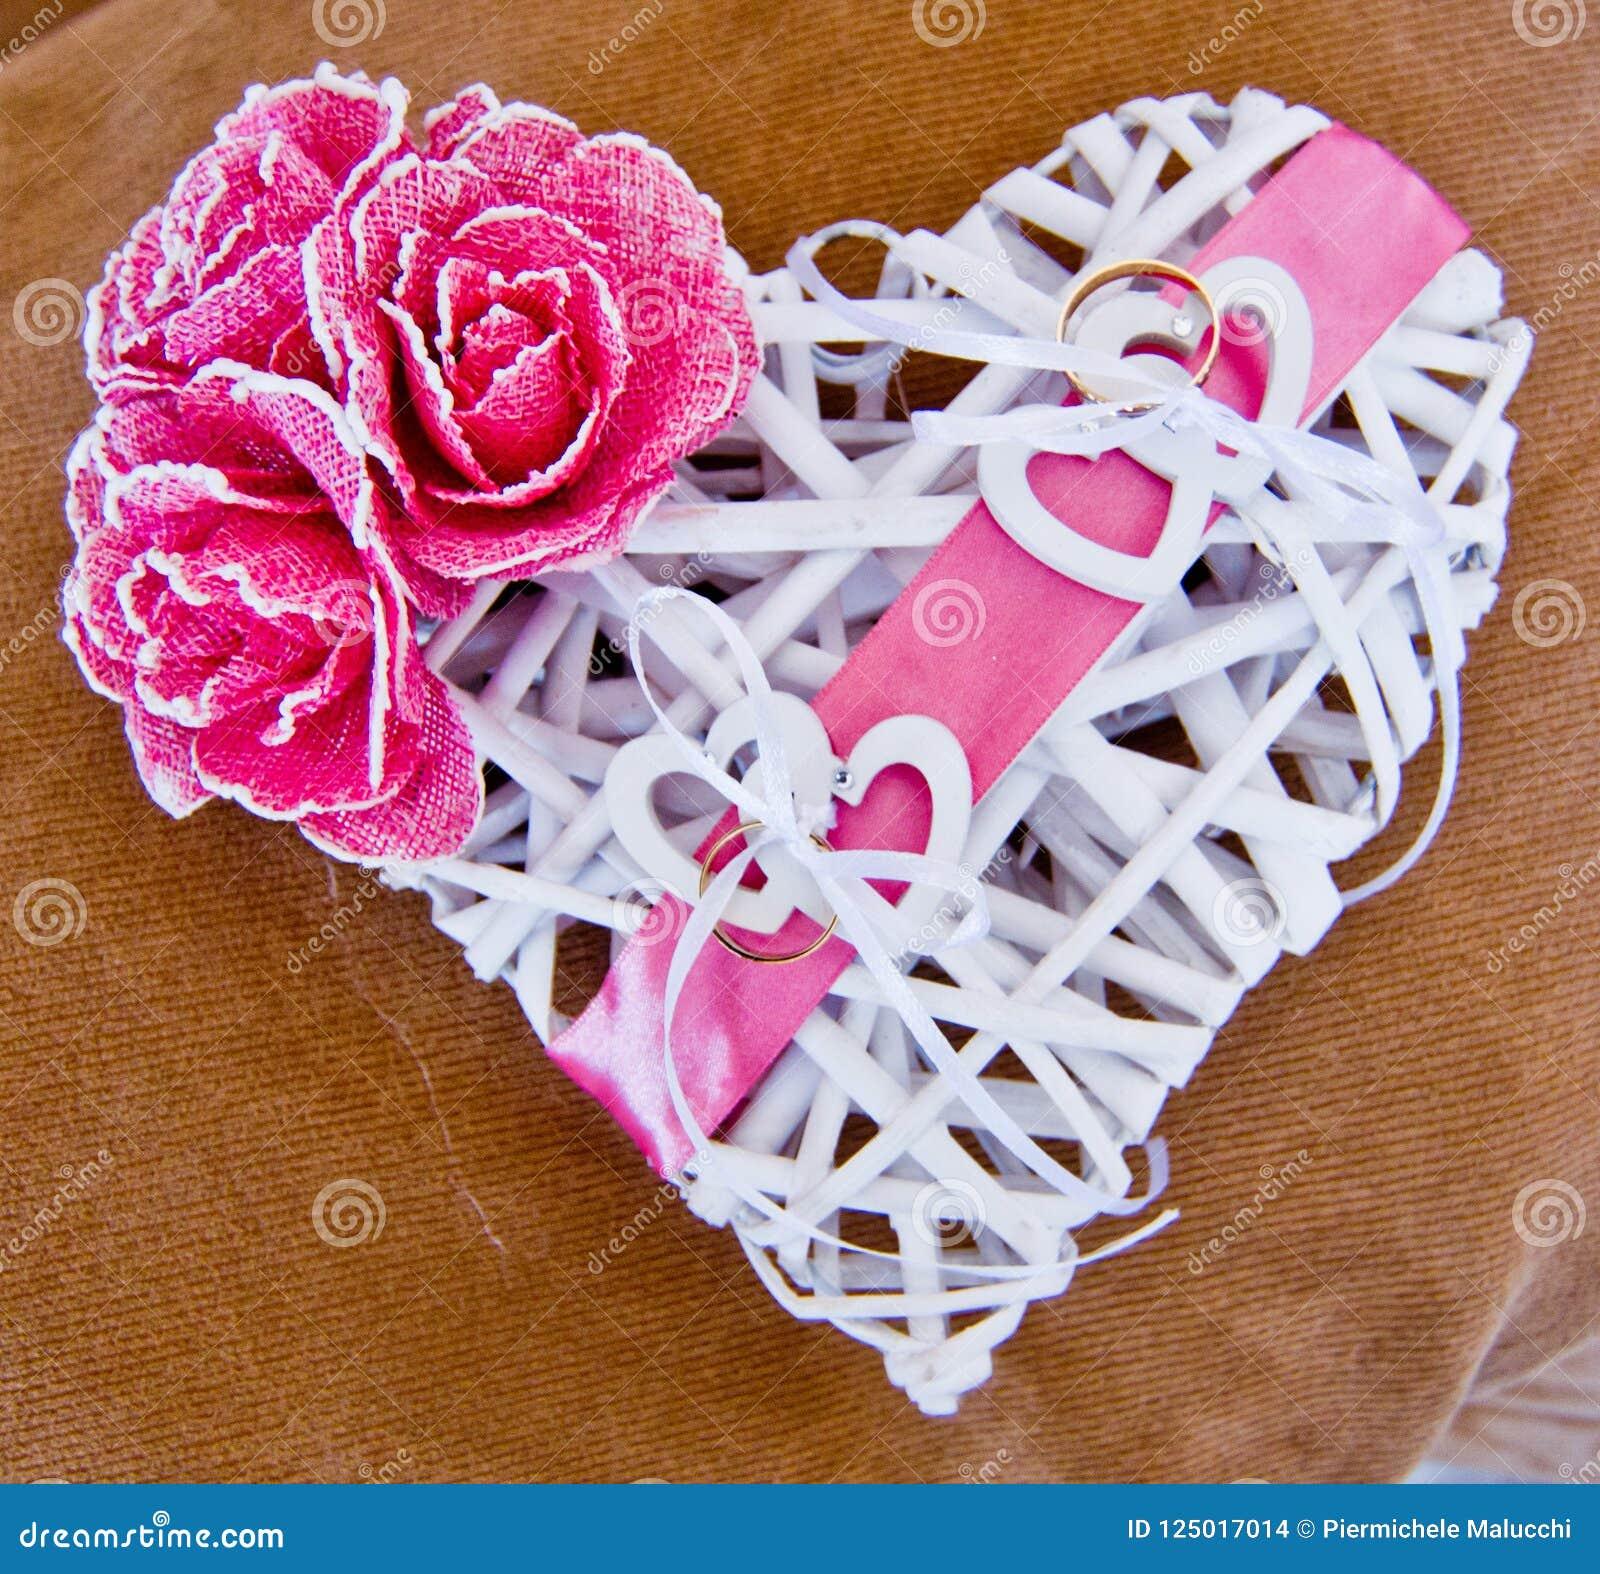 Wedding Rings On White Heart Stock Photo - Image of golden, jewel ...